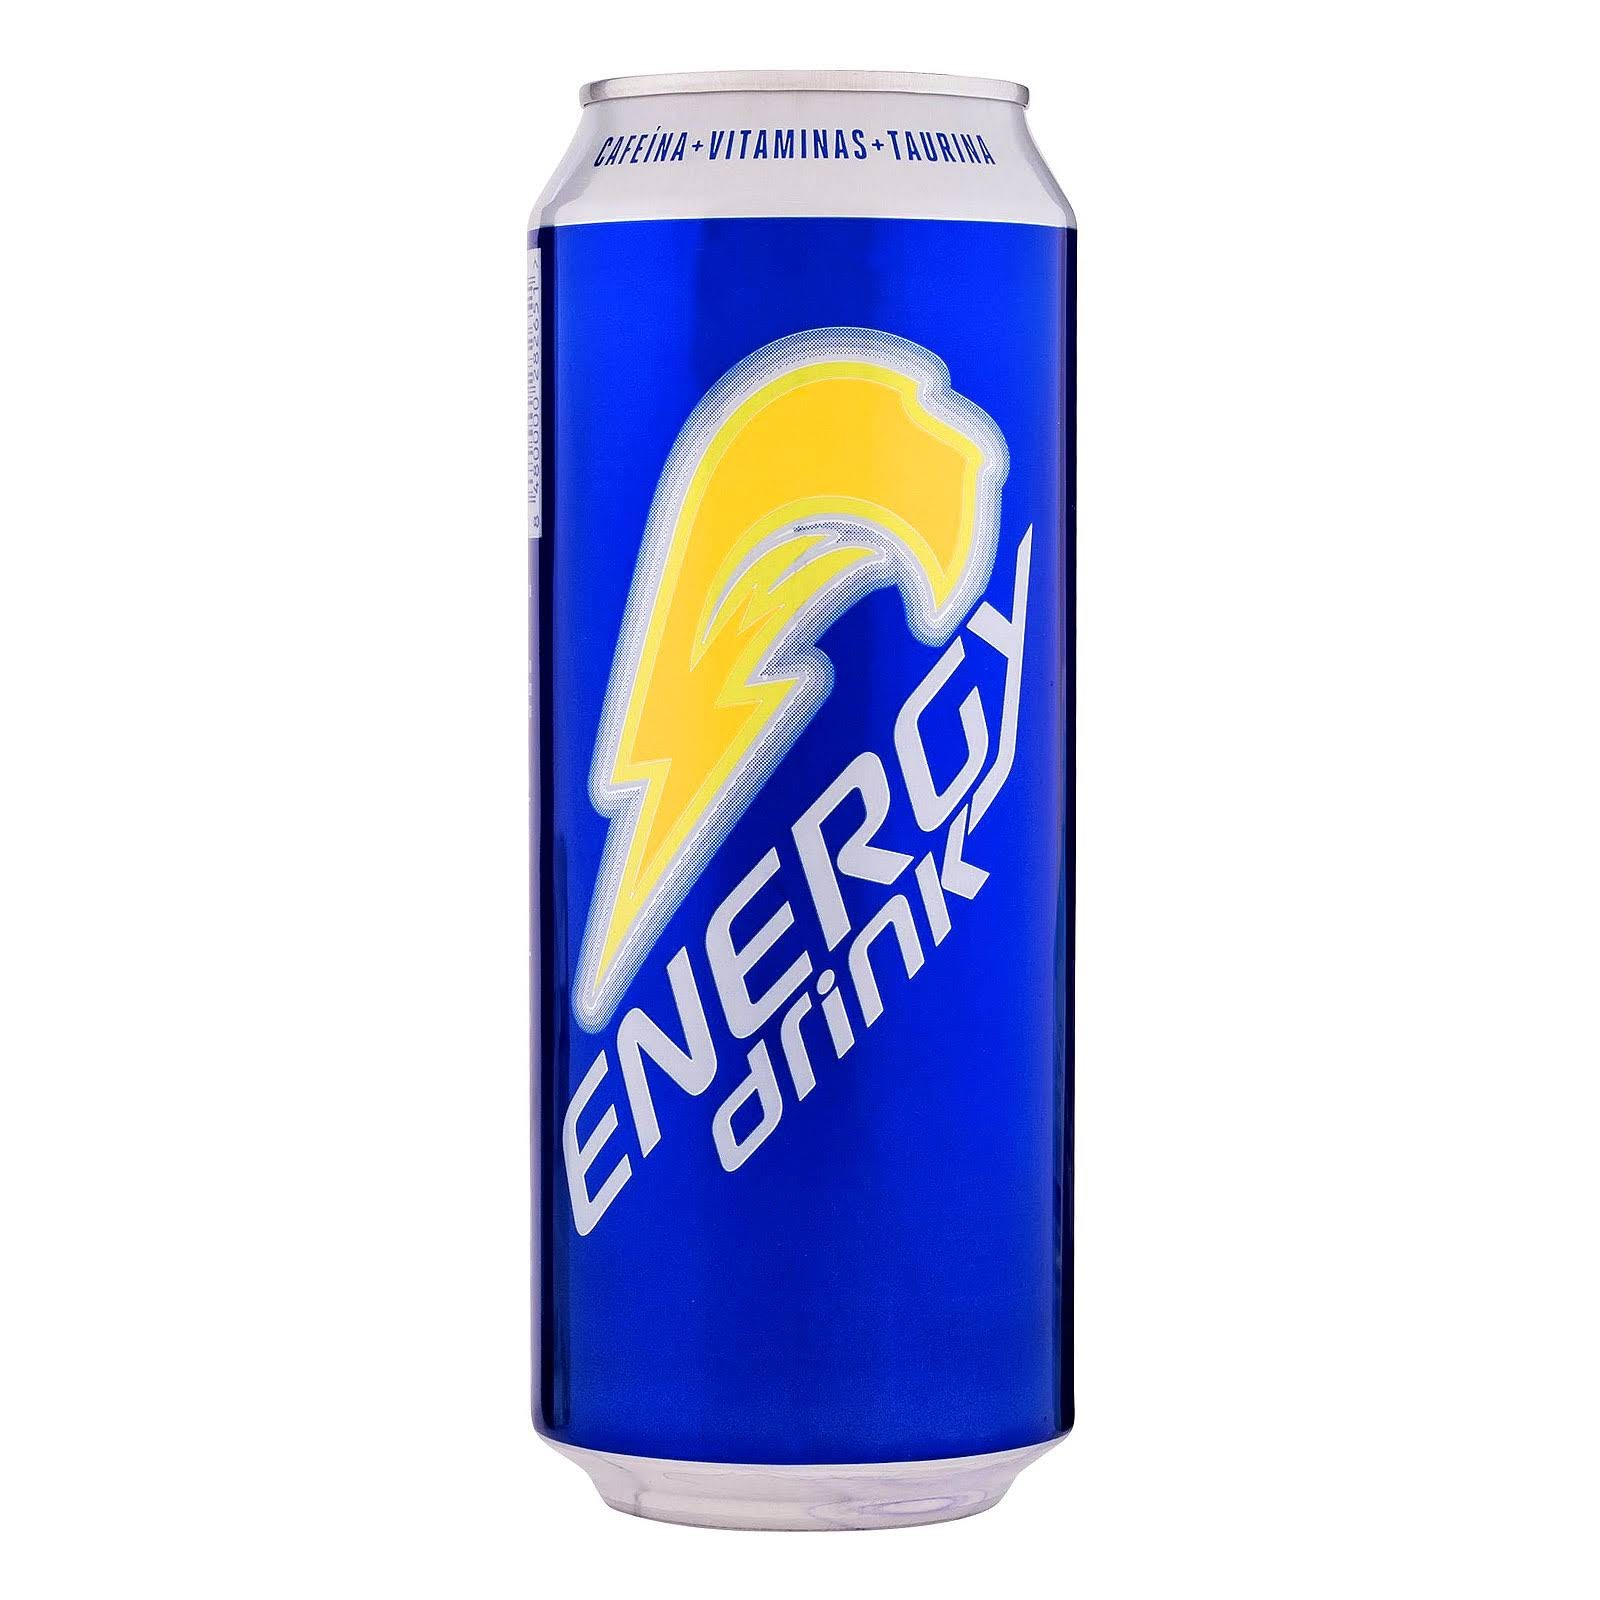 Bebida energética Energy Drink original Hacendado